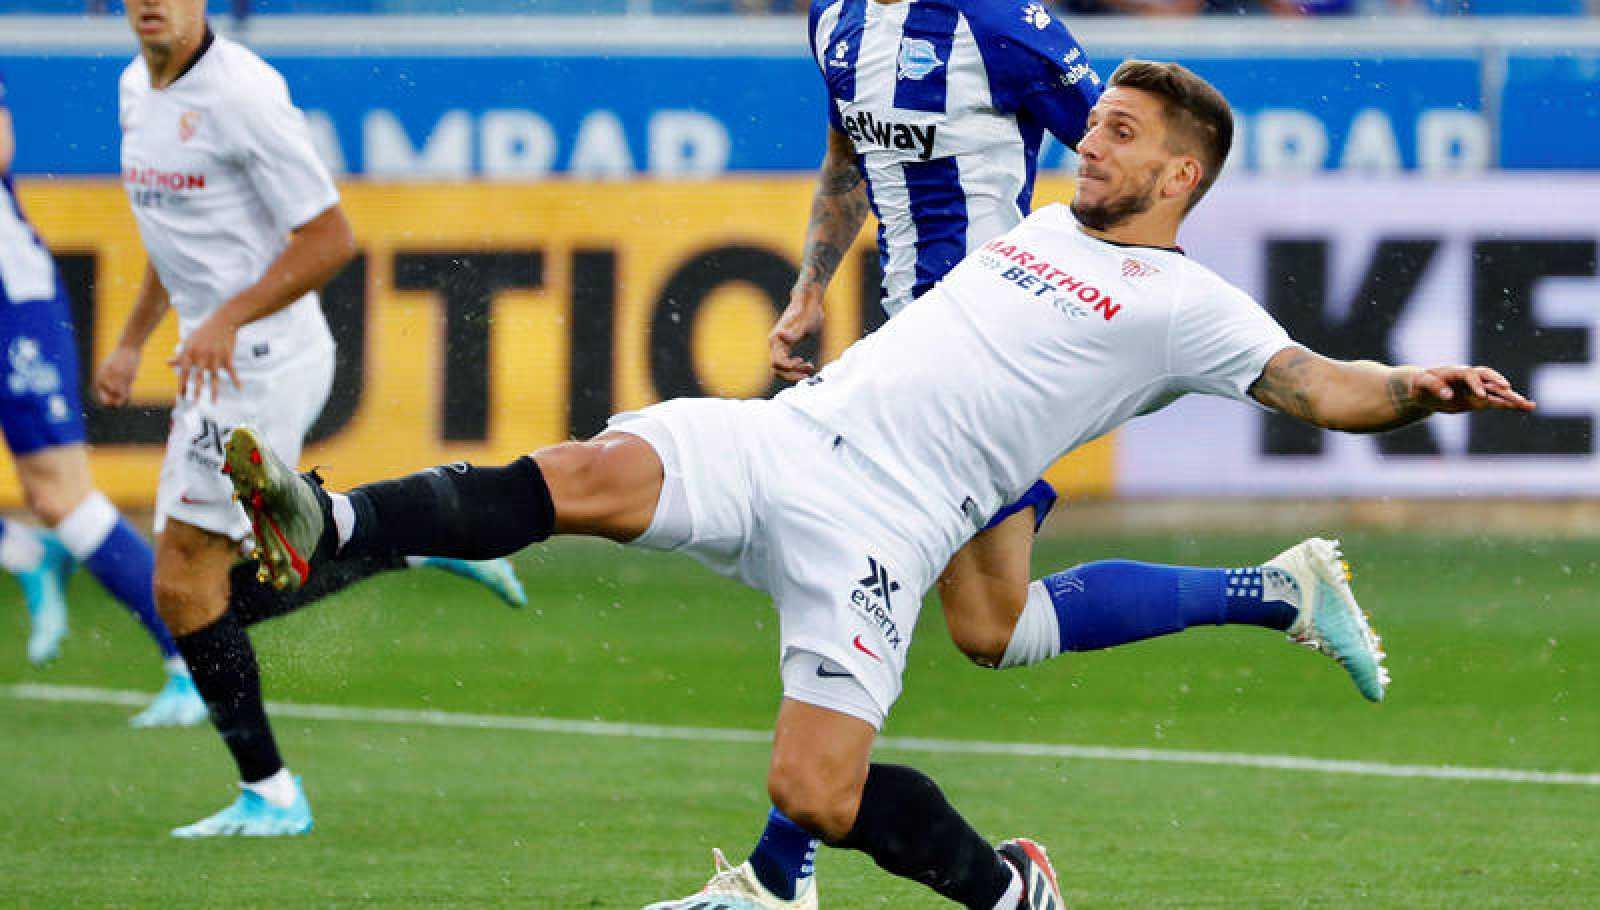 Daniel Carriço, en una imagen de archivo.